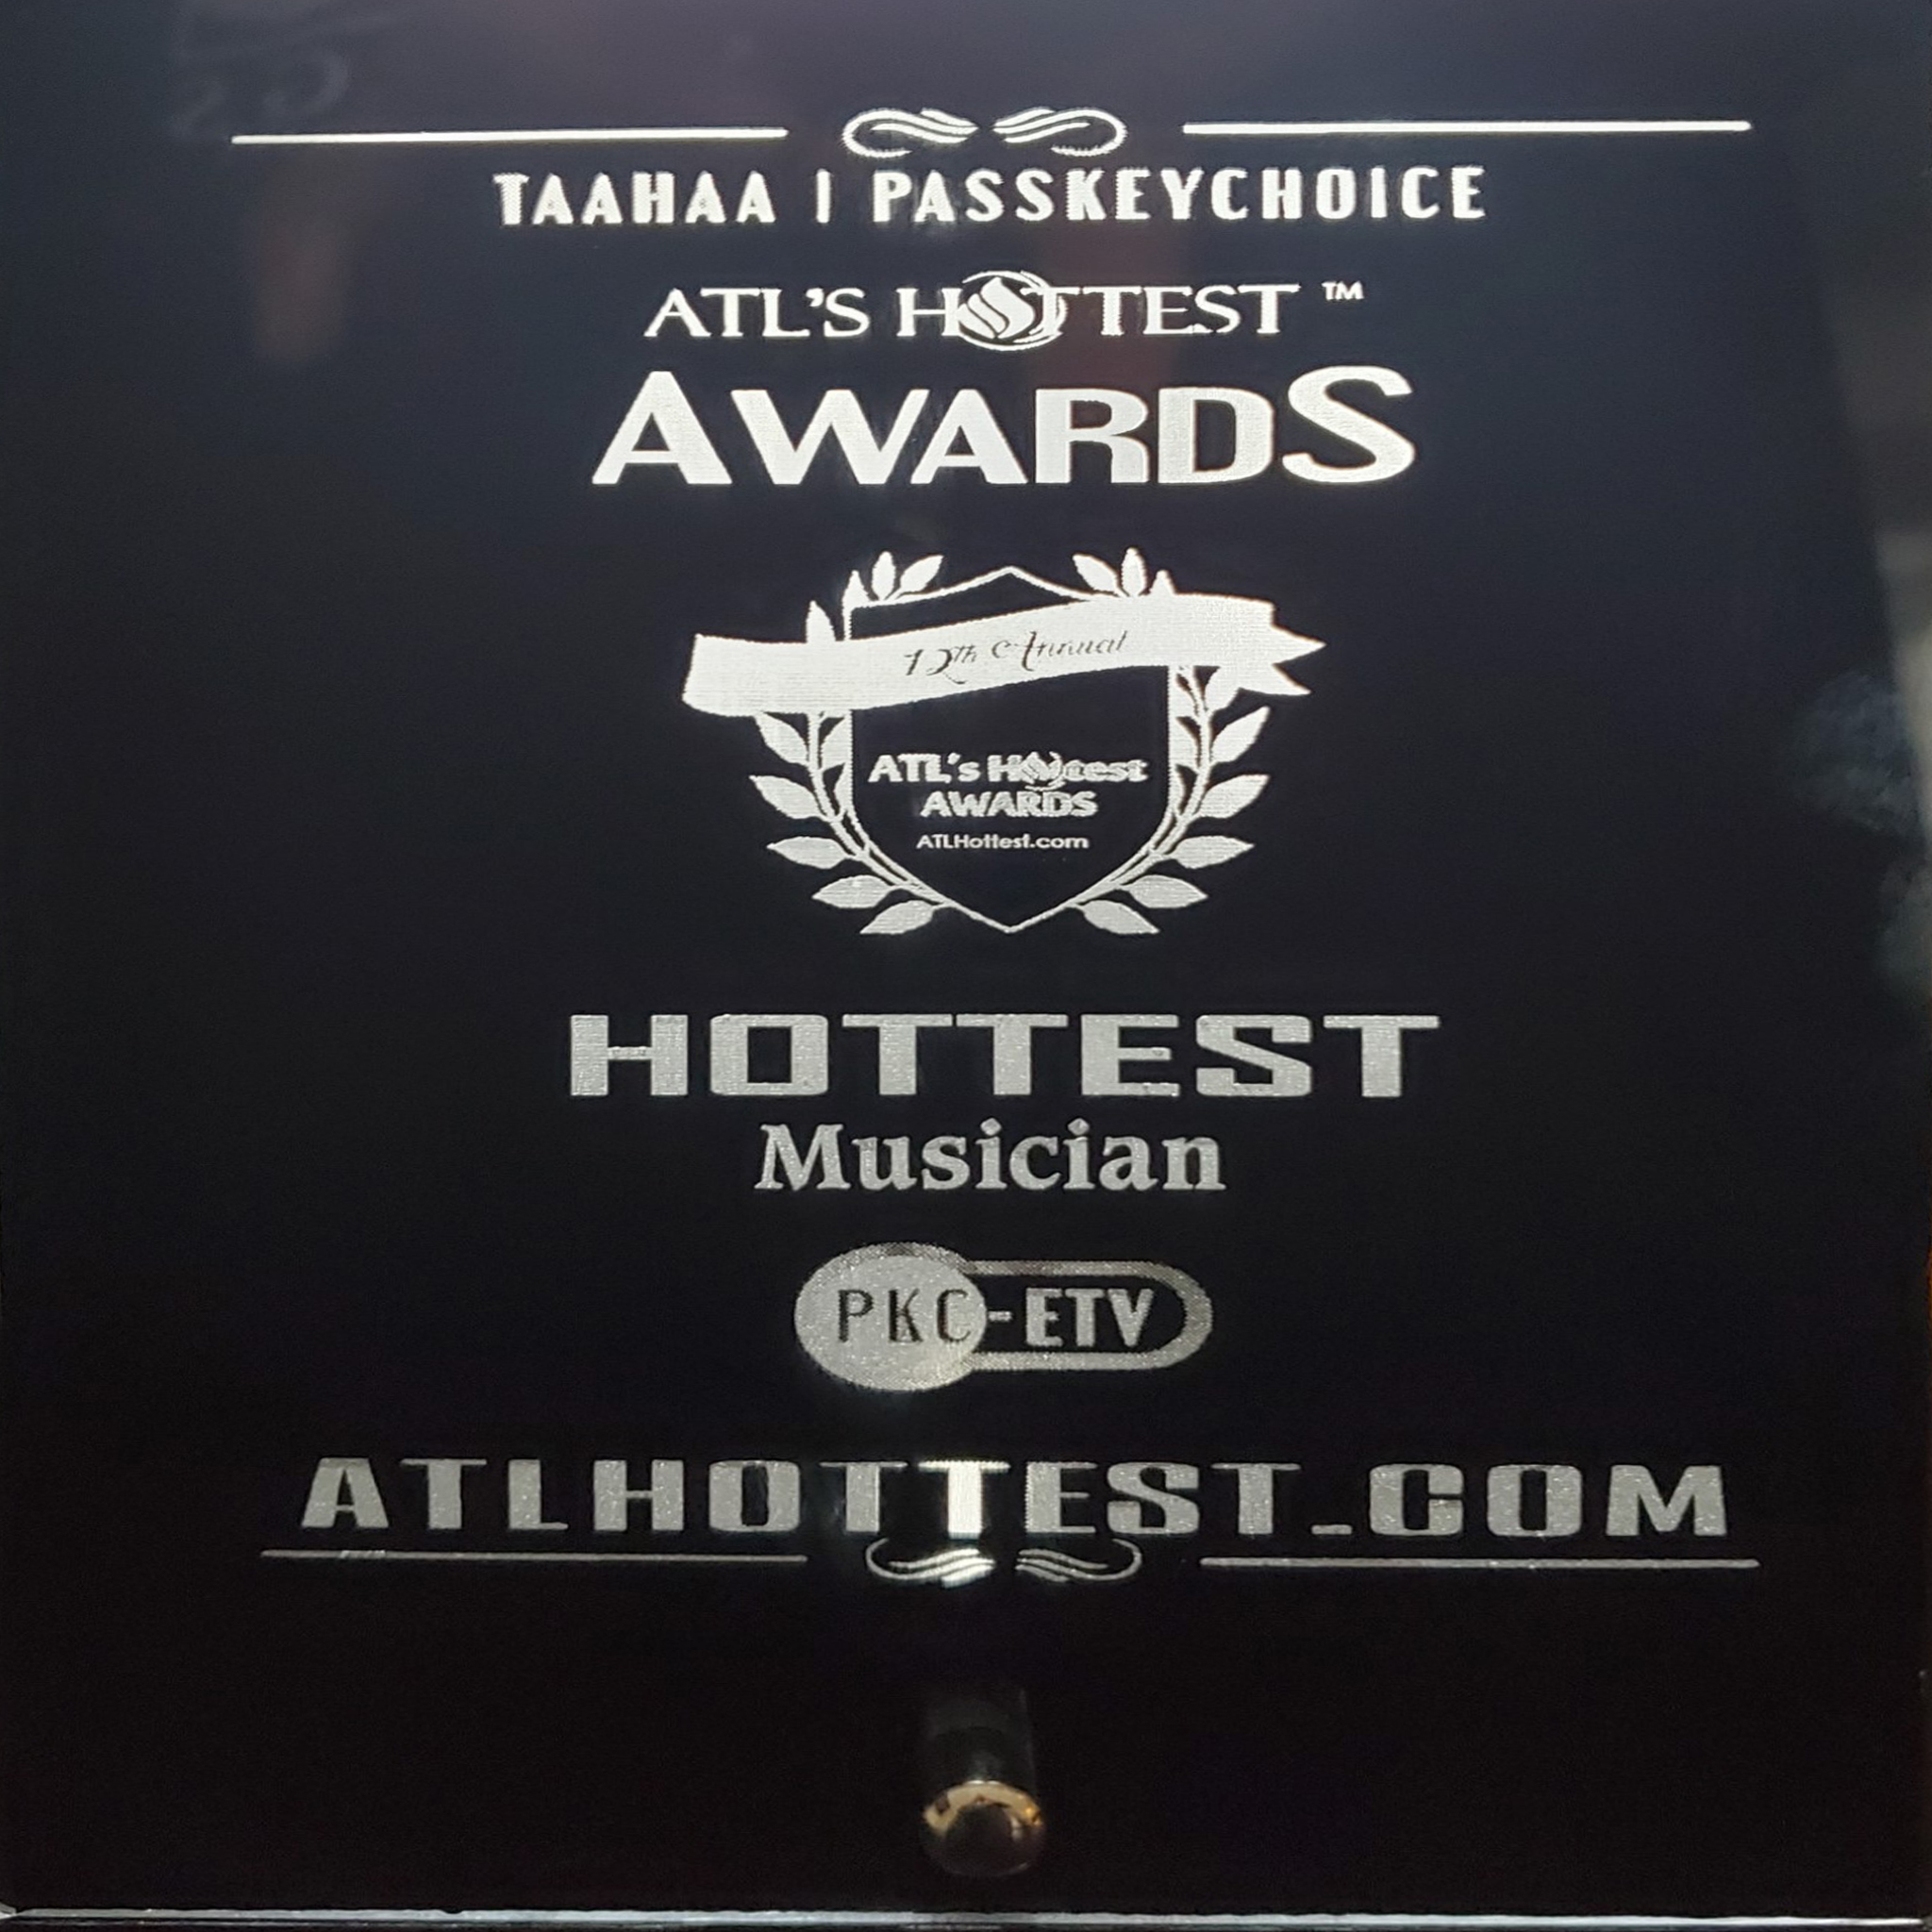 ATL Hottest Musician